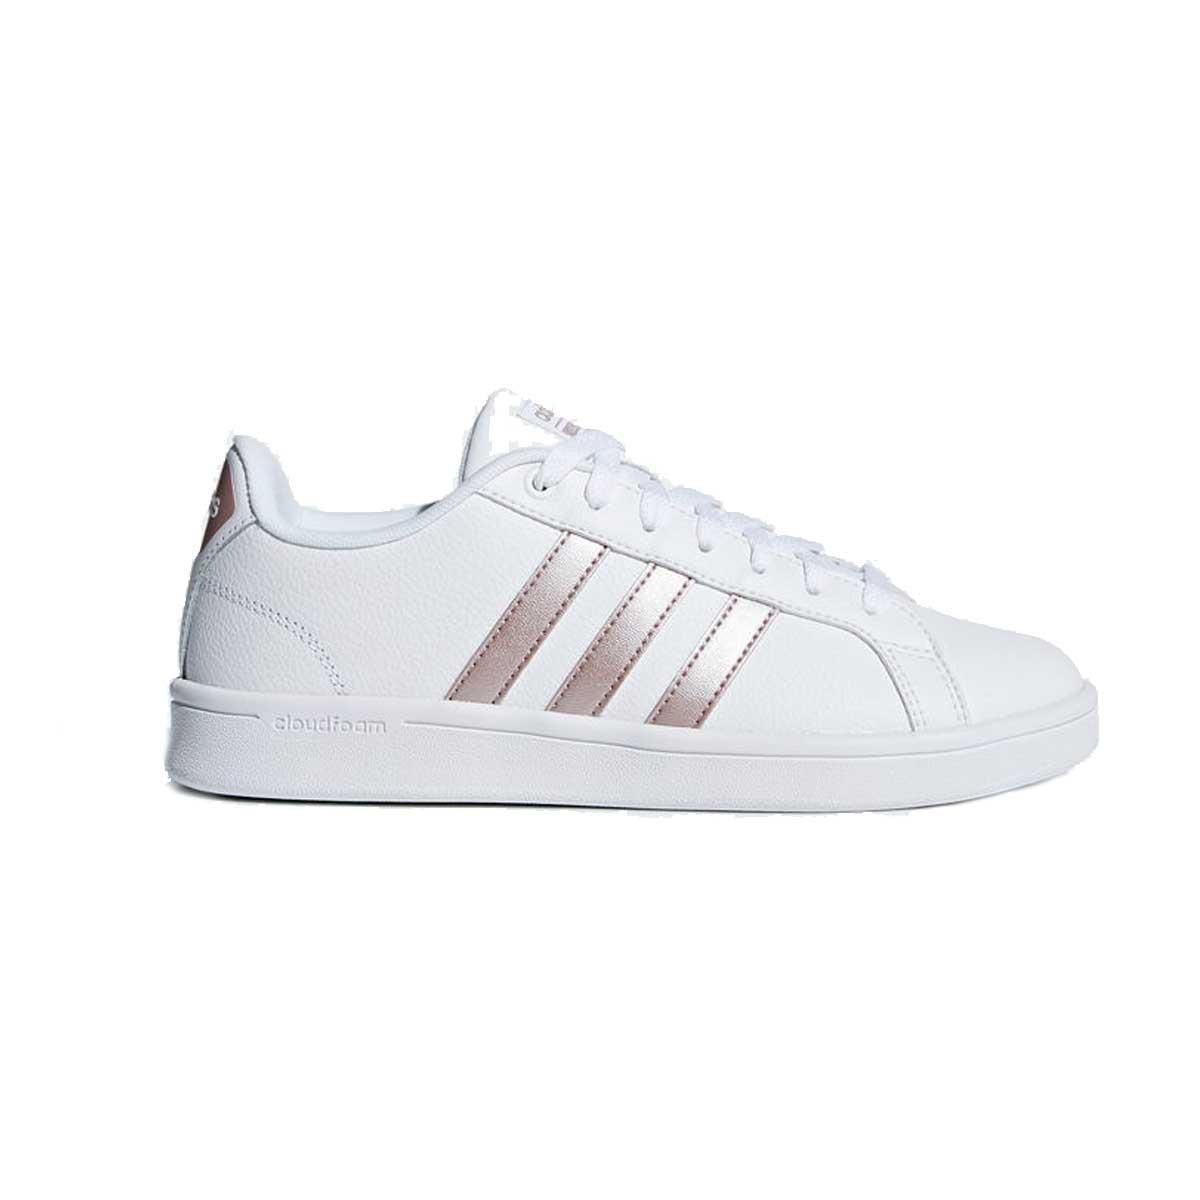 169dd365299 Tênis Adidas Cloudfoam Advantage Feminino